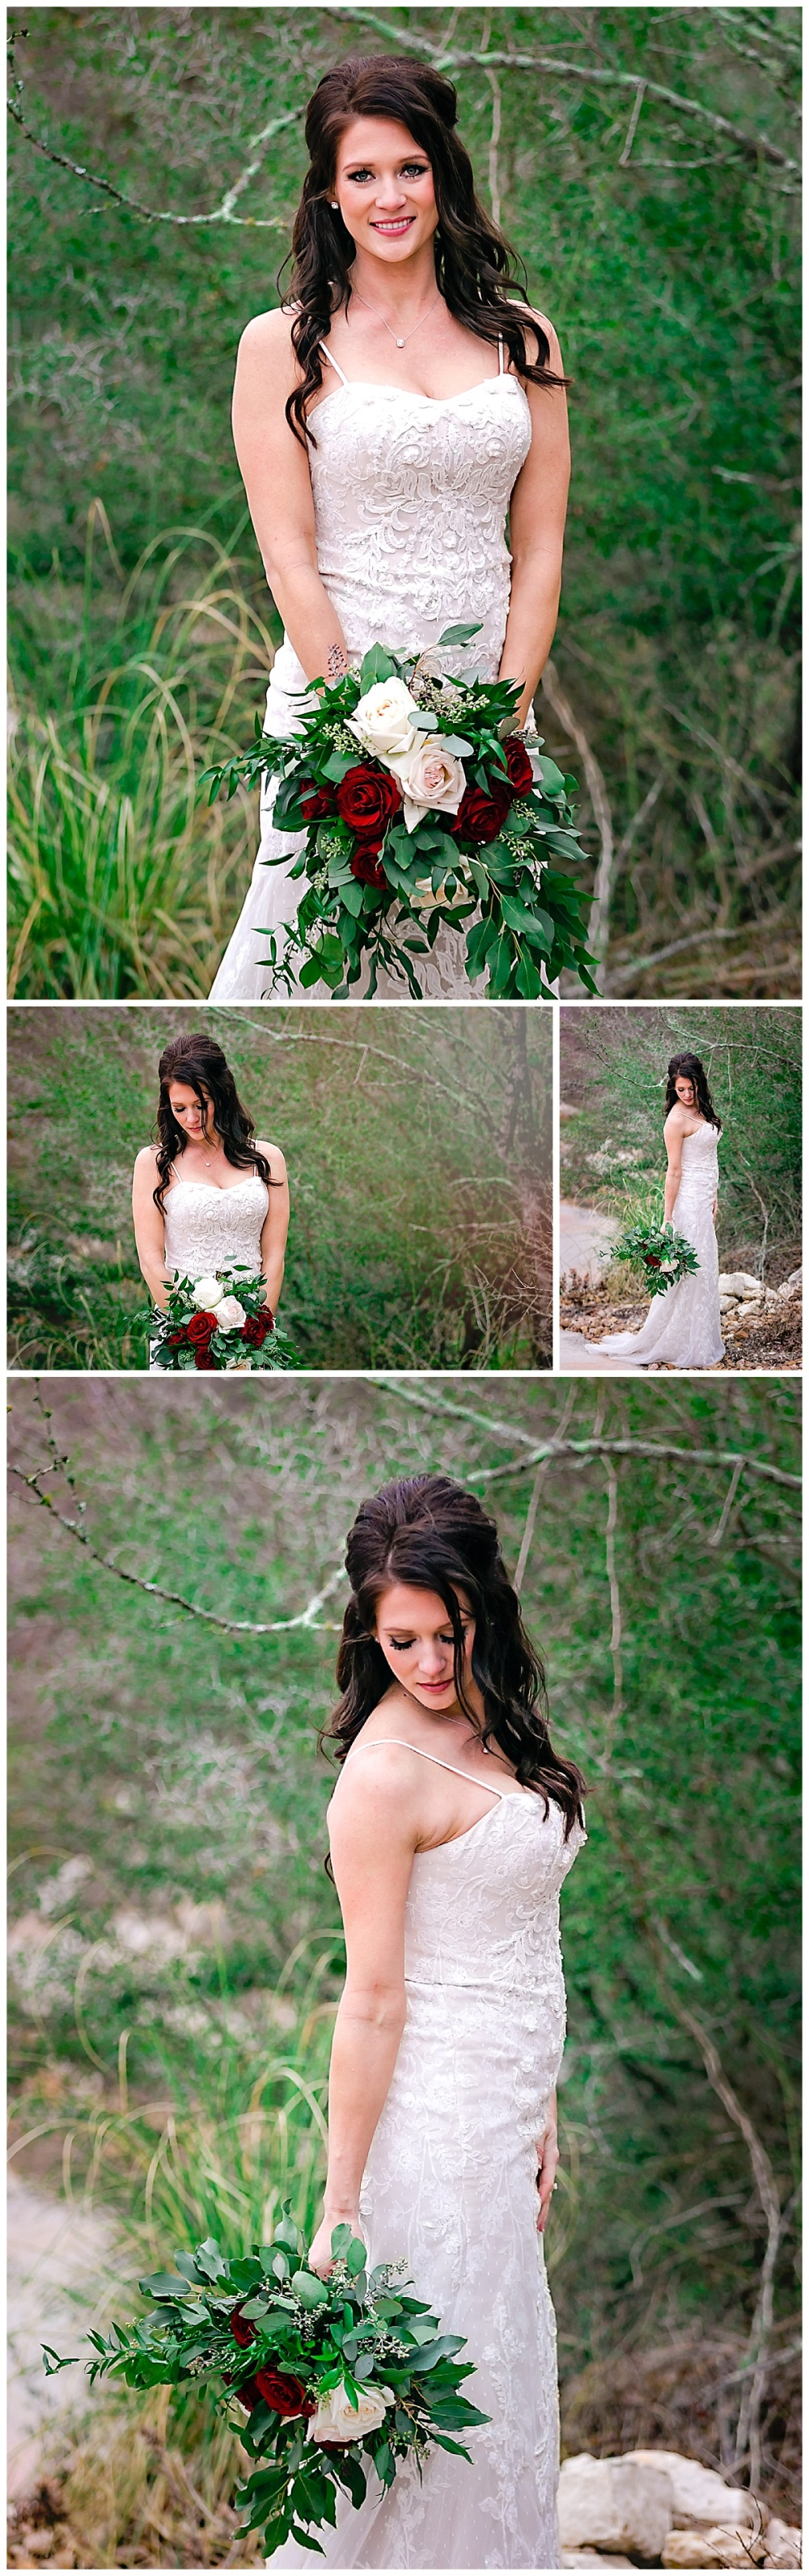 Carly-Barton-Photography-Geronimo-Oaks-Wedding-Venue-Texas-Hill-Country-Ronnie-Sarah_0074.jpg